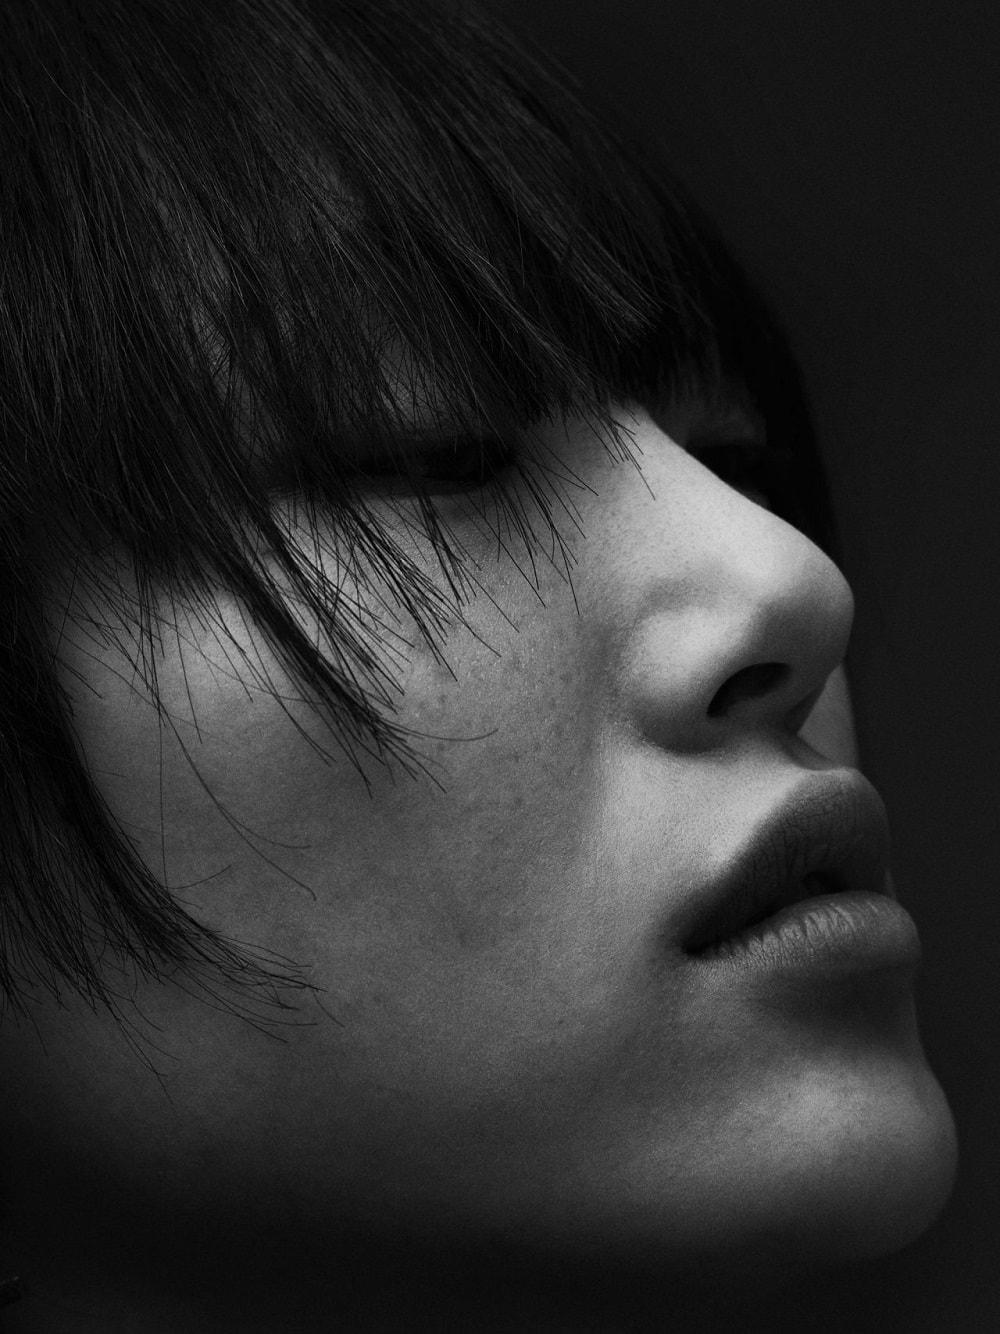 Sora Choi by Yvan Fabing x Michelle Cameron